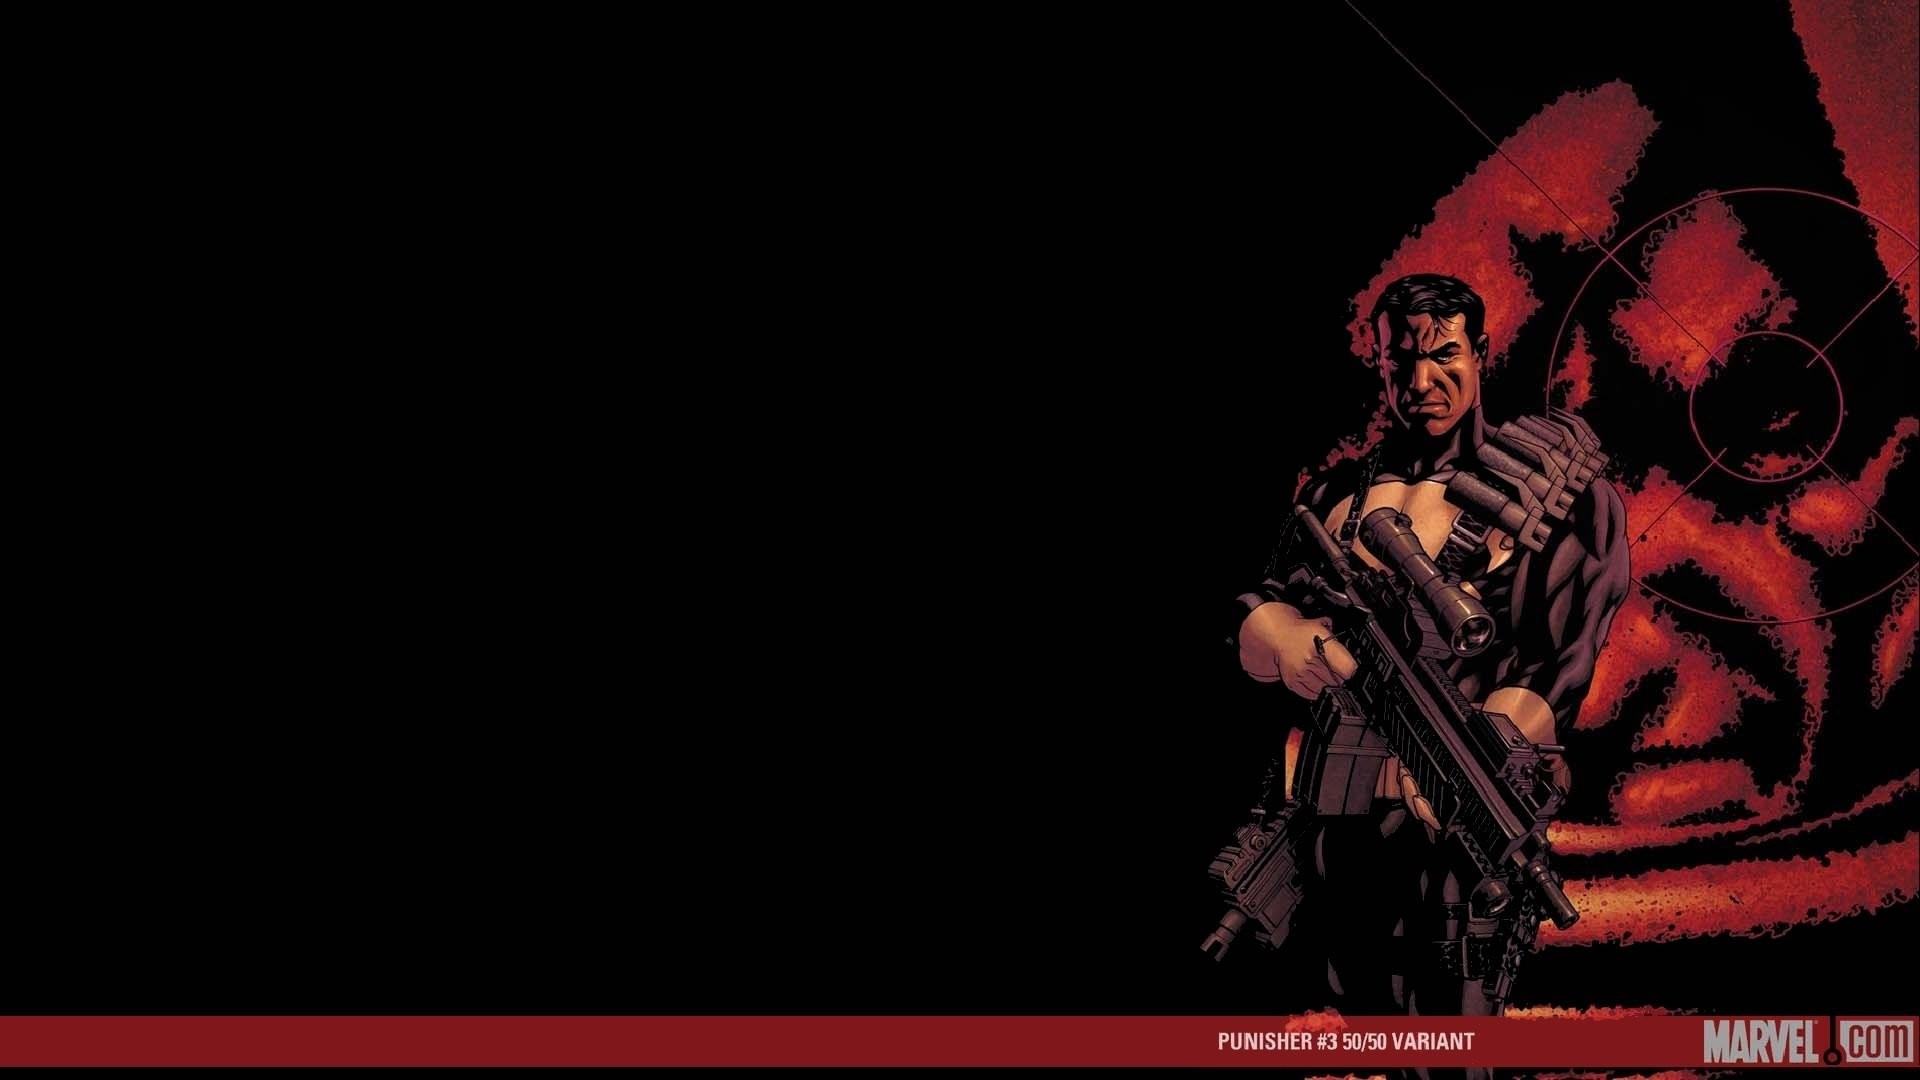 Comics – The Punisher Frank Castle Punisher Wallpaper